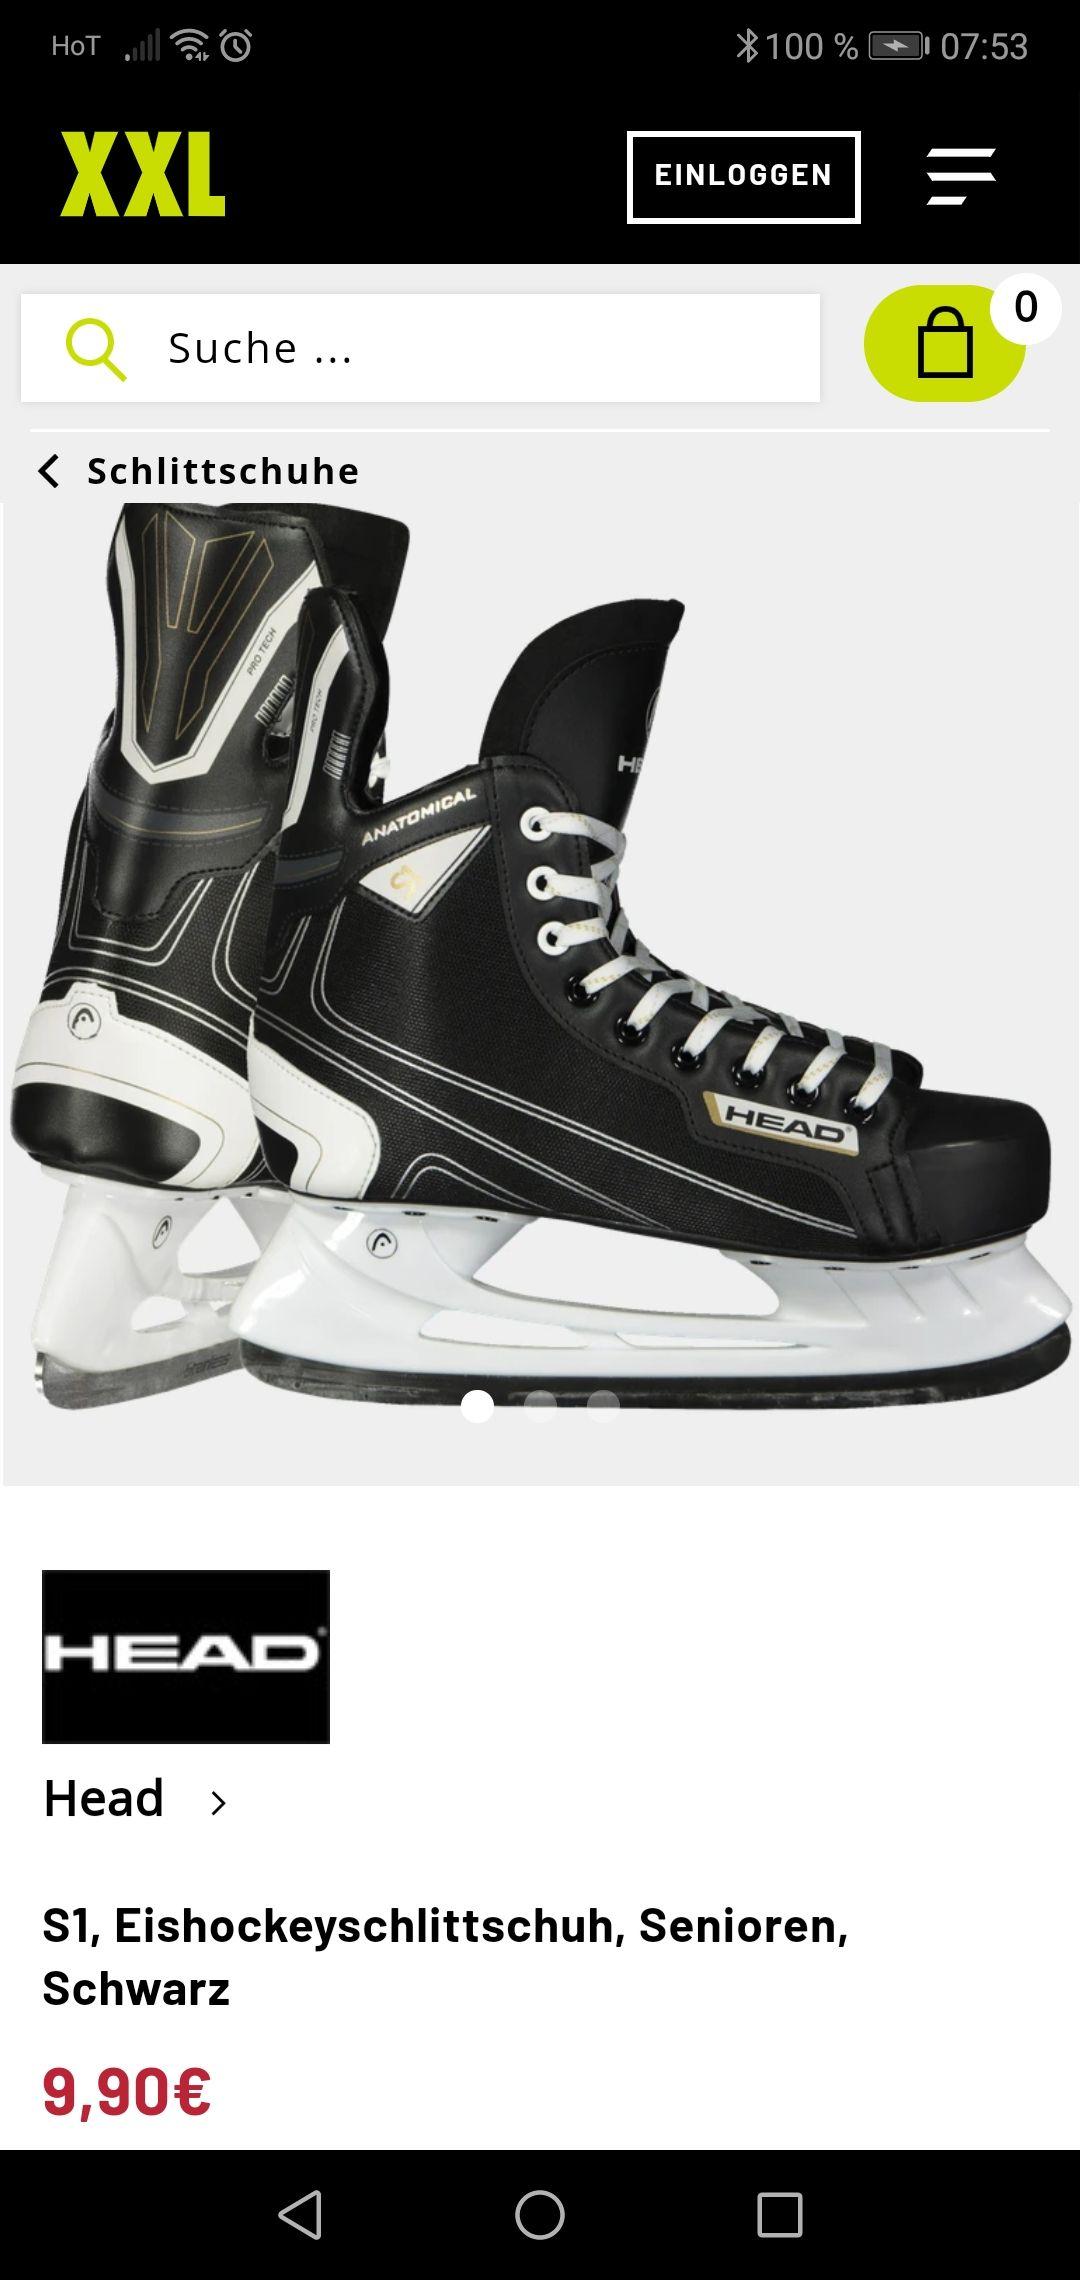 XXL Sports Head hockey schlittschuhe um 9.90